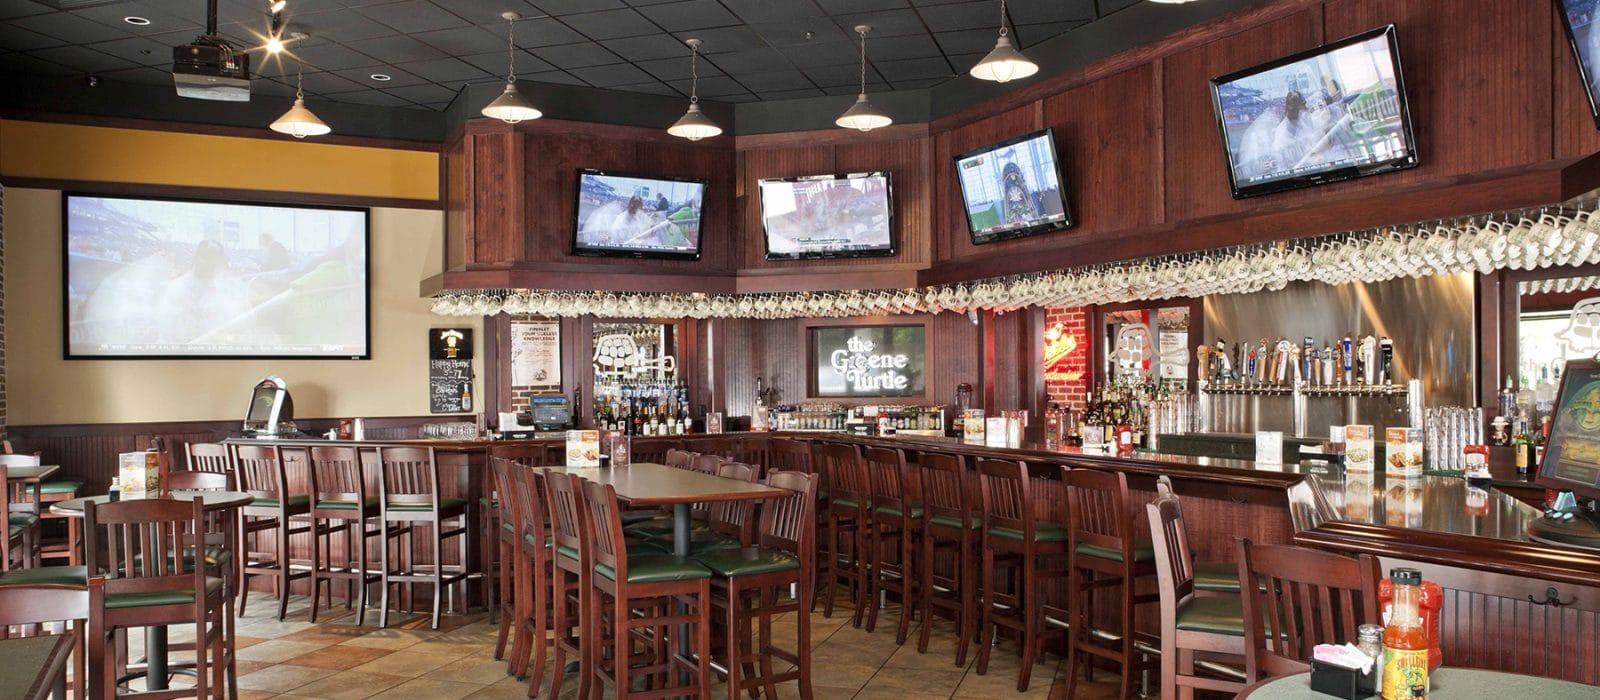 Greene Turtle Sports Bar and Grille Bar